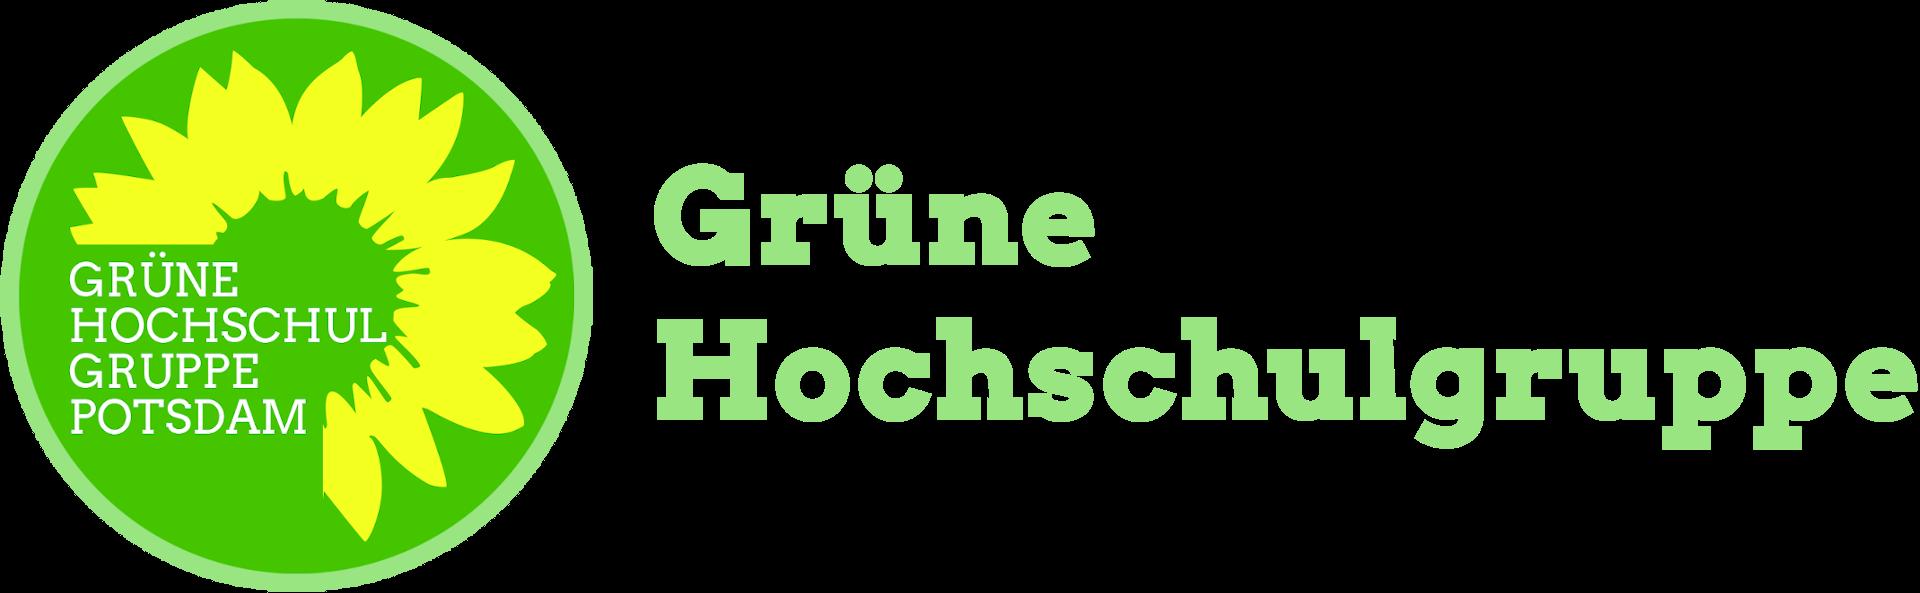 GHG Potsdam – Grüne Hochschulgruppe Potsdam